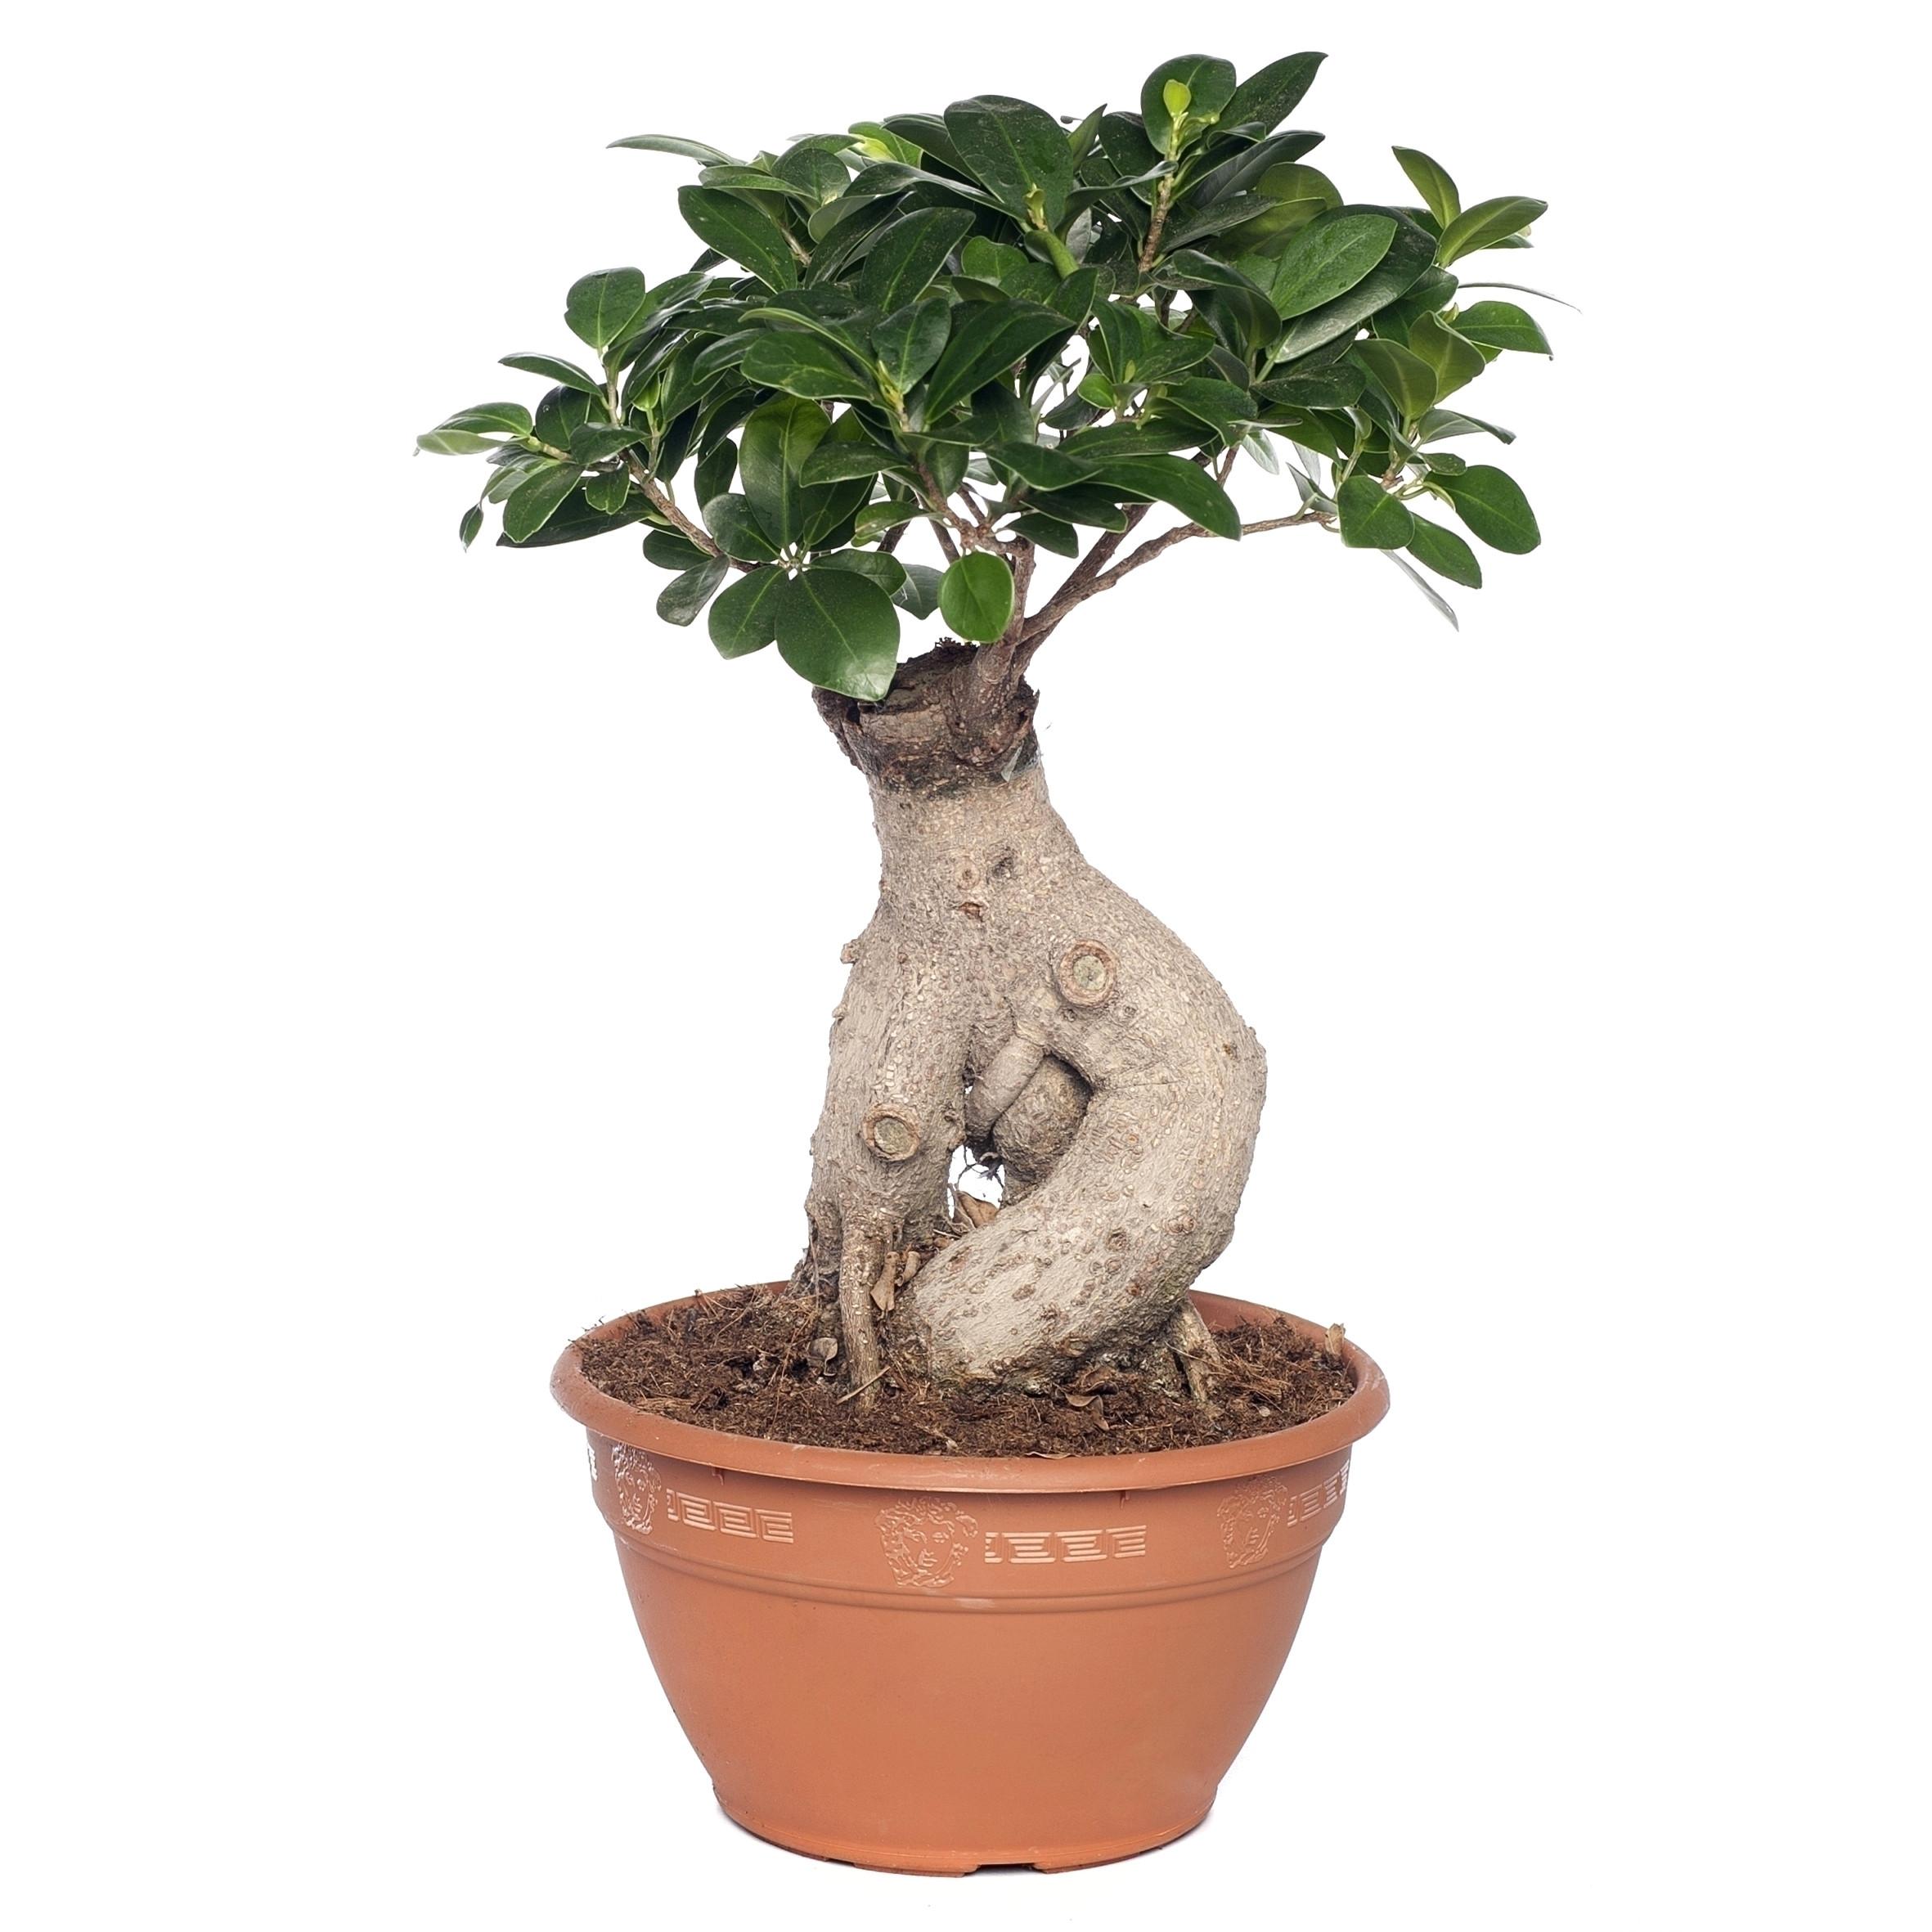 ficus microcarpa ginseng pflege neu bonsai verzorgen podocarpus bonsai with bonsai verzorgen top